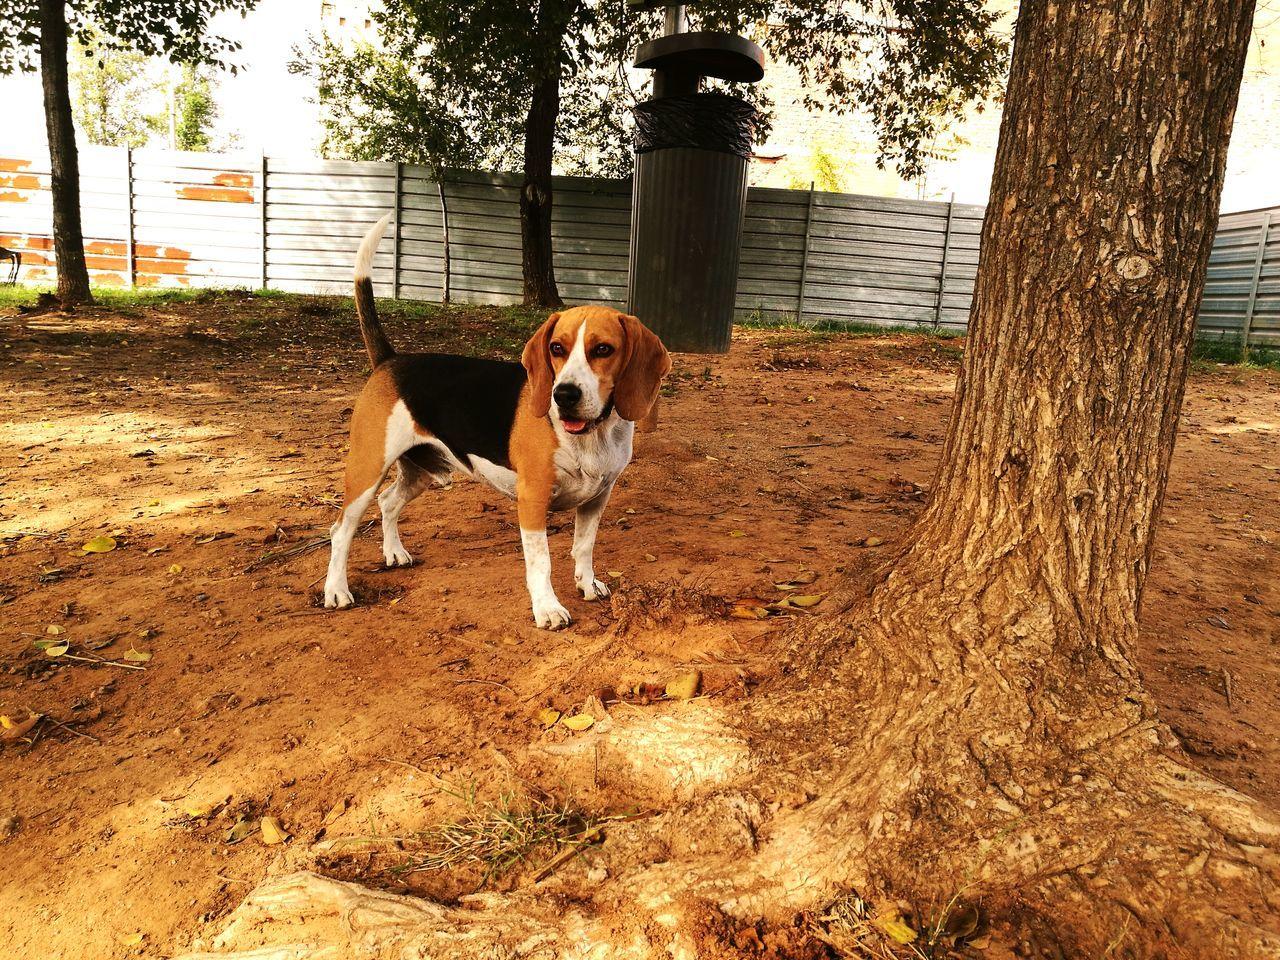 Beagle. Animal Themes Beagle Beaglelovers Beagleoftheday Beaglemix Beaglemania Beaglelove Gordo Bebe Dogslife Dog Day Domestic Animals Pets One Animal No People Nature First Eyeem Photo